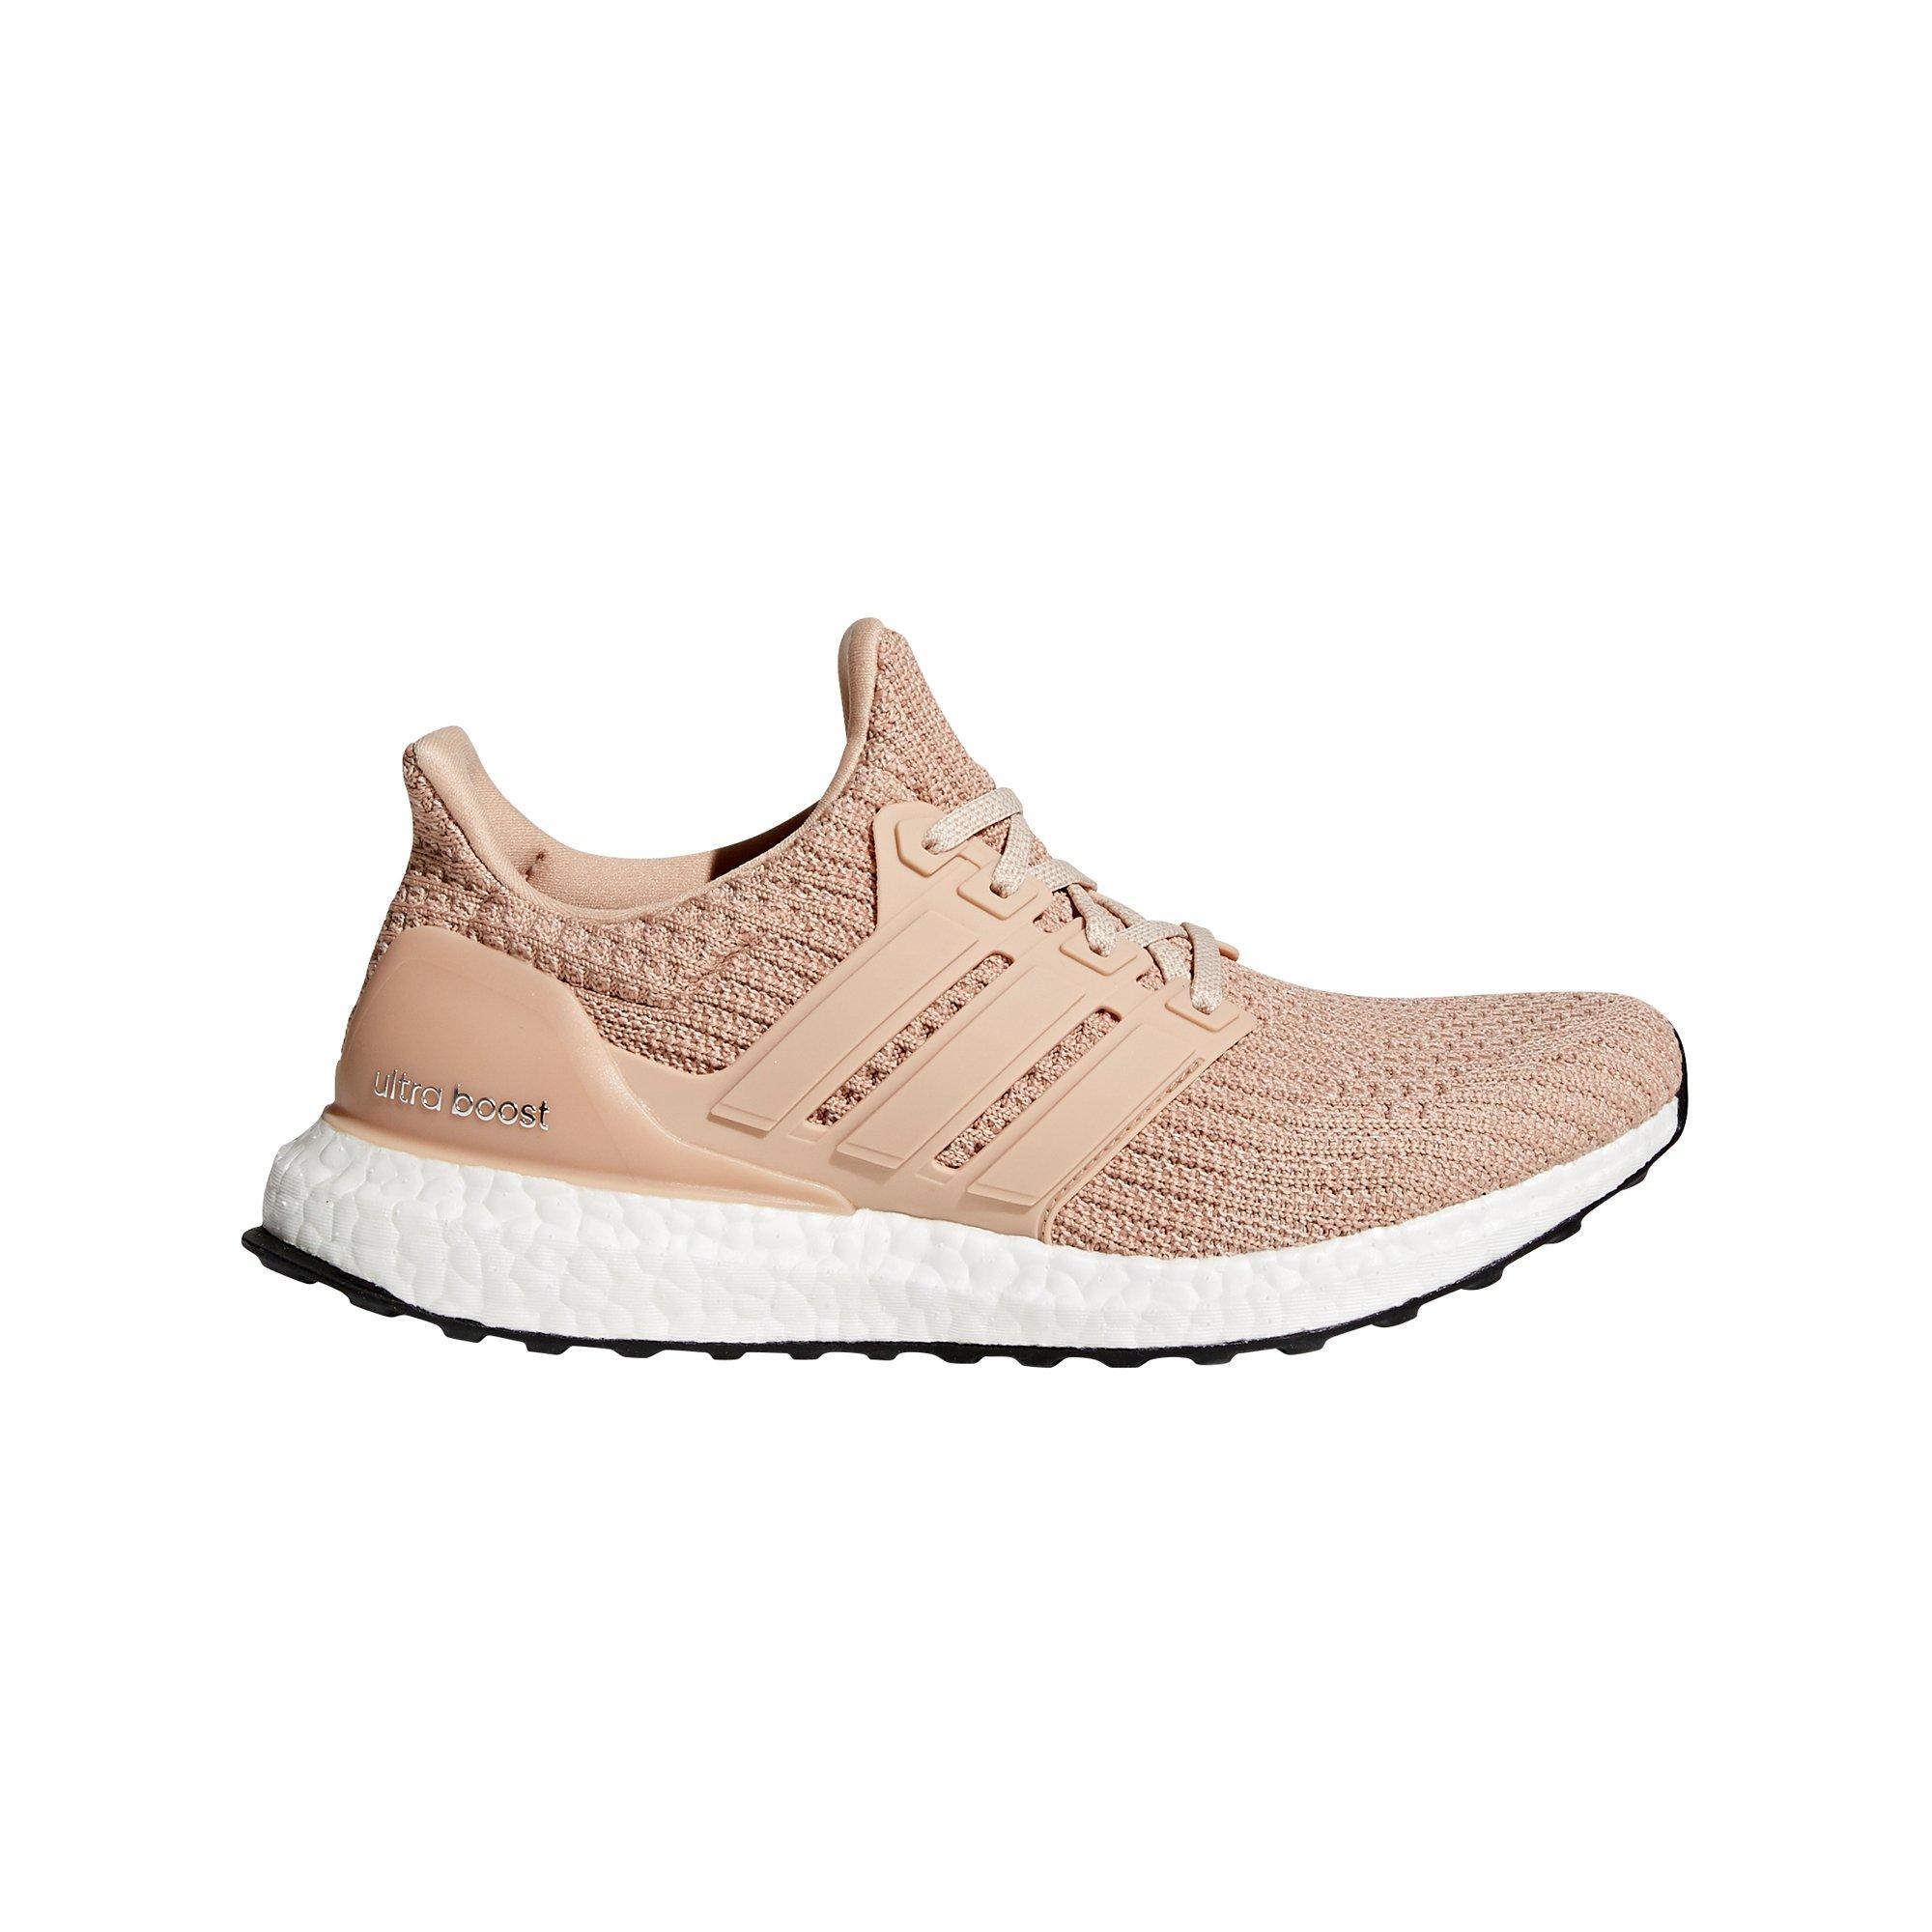 Shoe Type